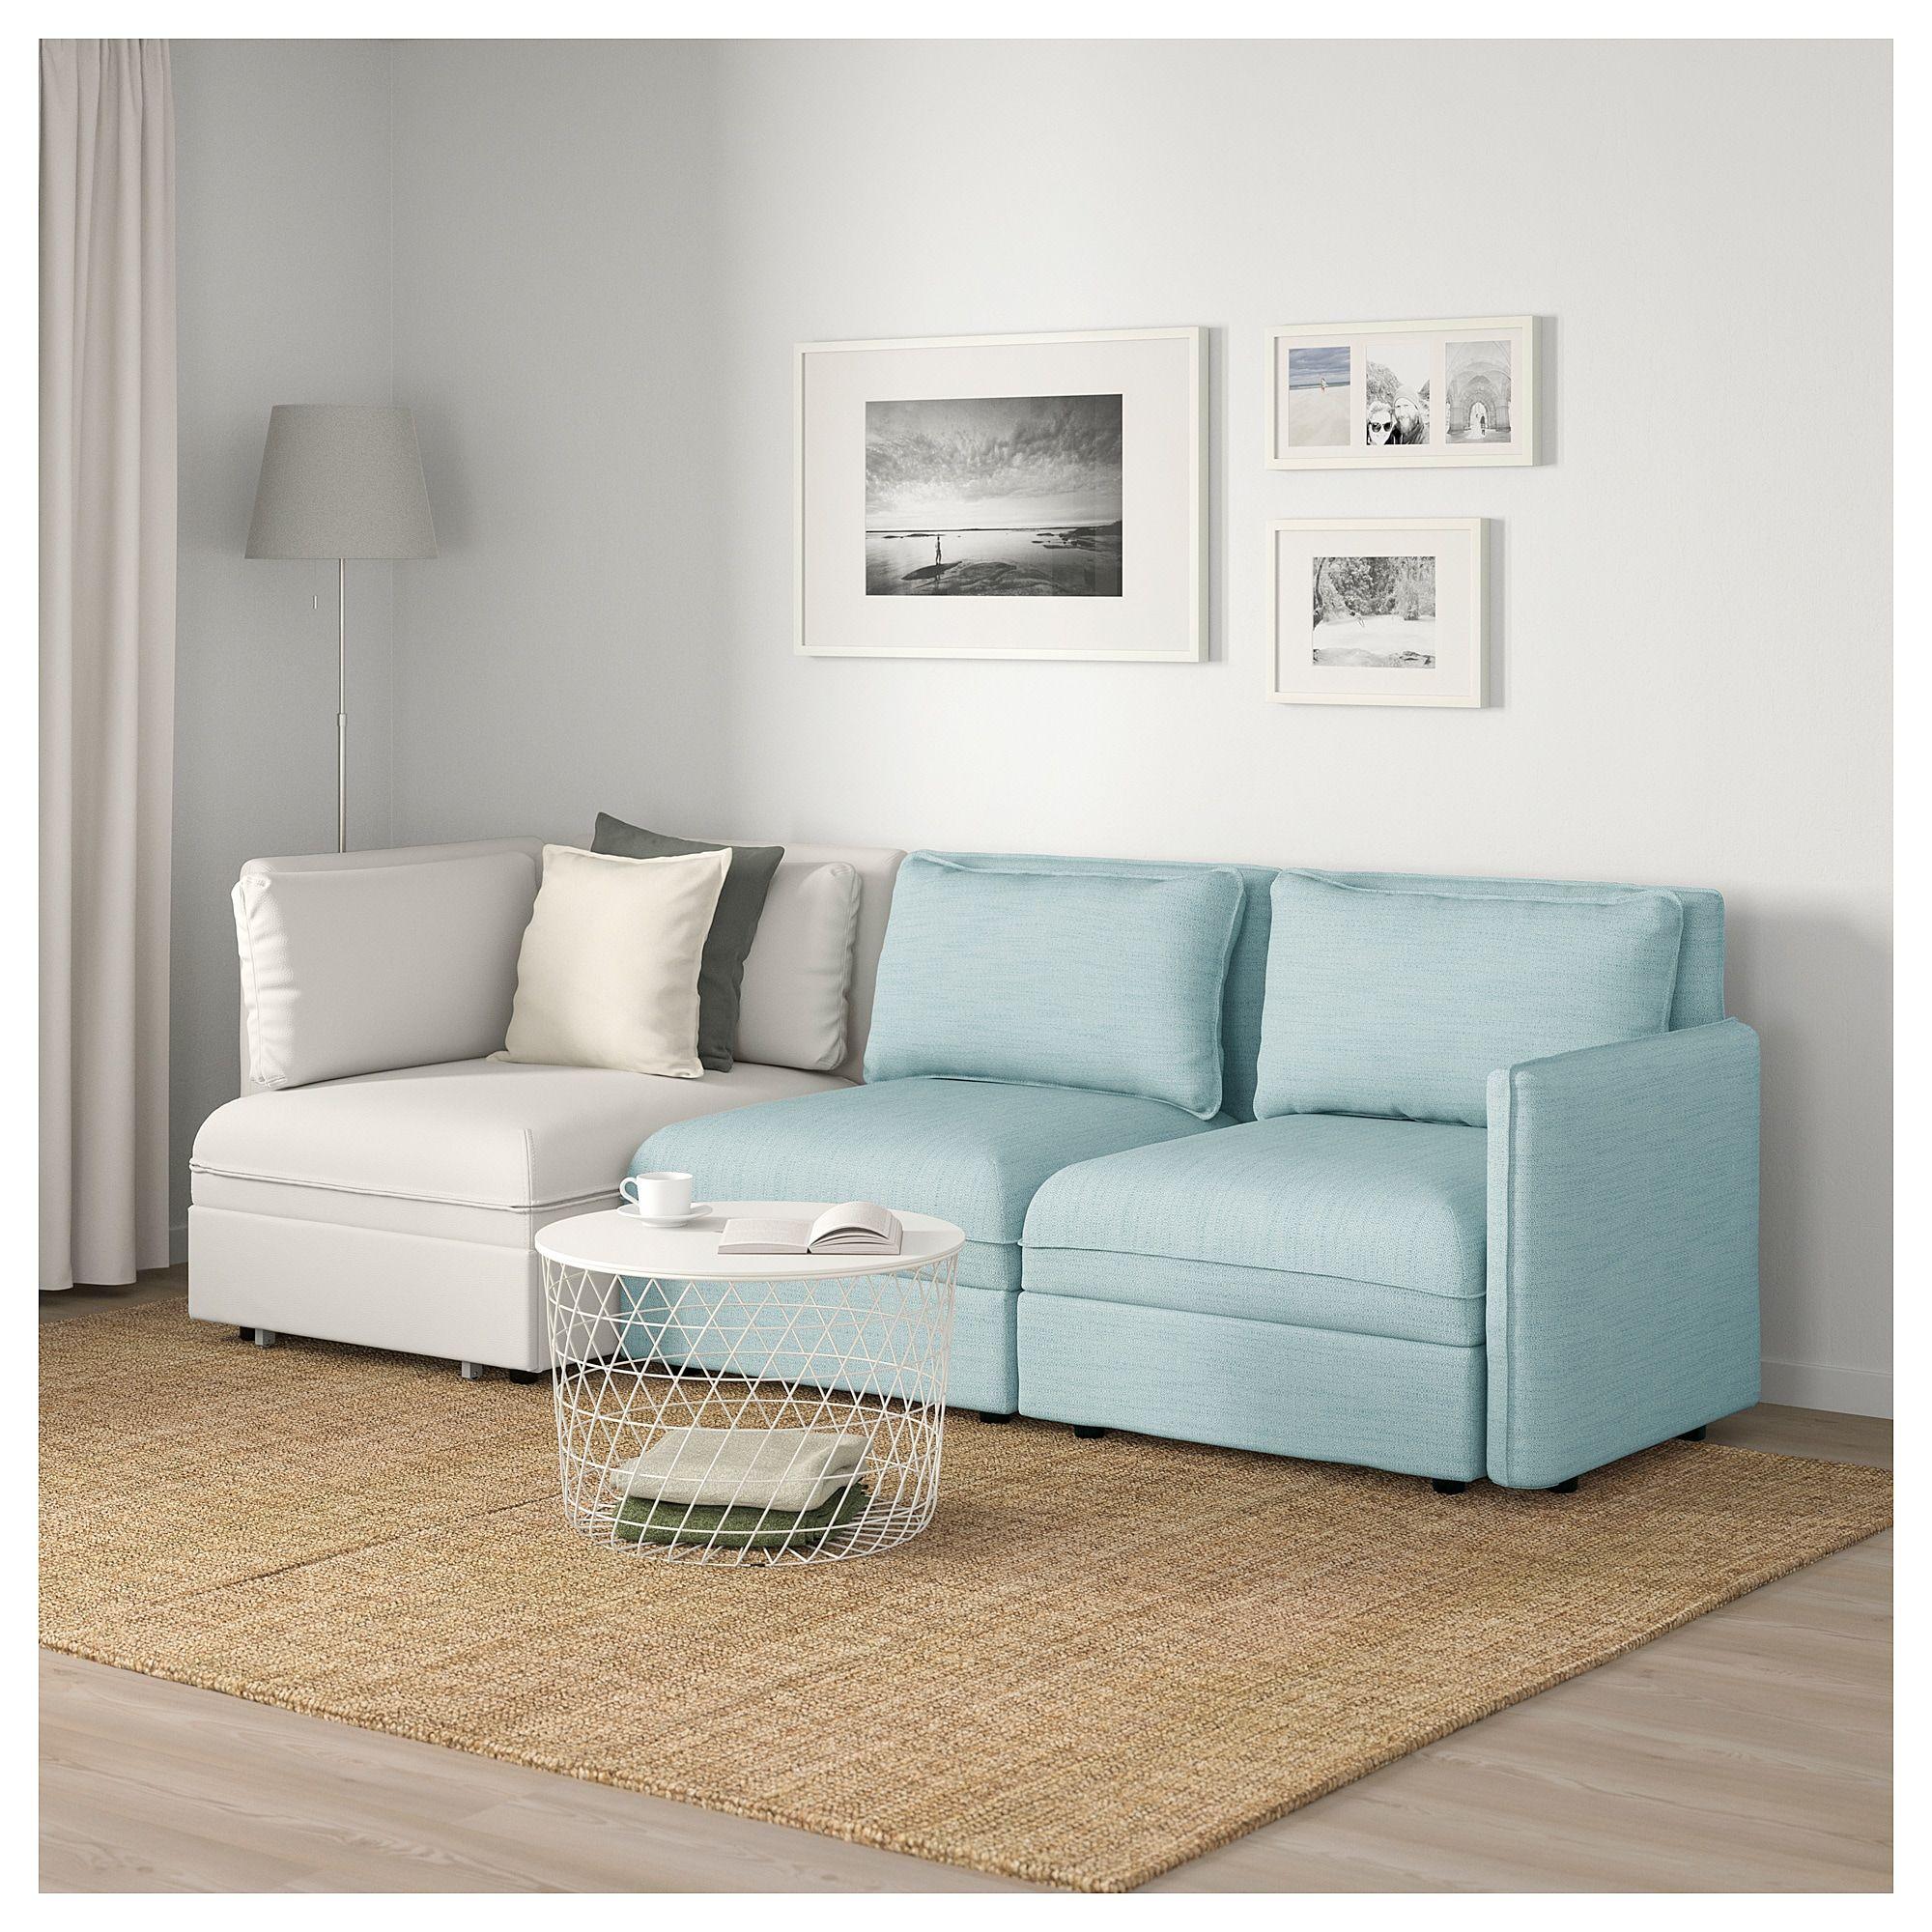 Vallentuna 3 Seat Modular Sleeper Sofa And Storage Hillared Murum Light Blue White Modular Sofa Sofa Sleeper Sofa